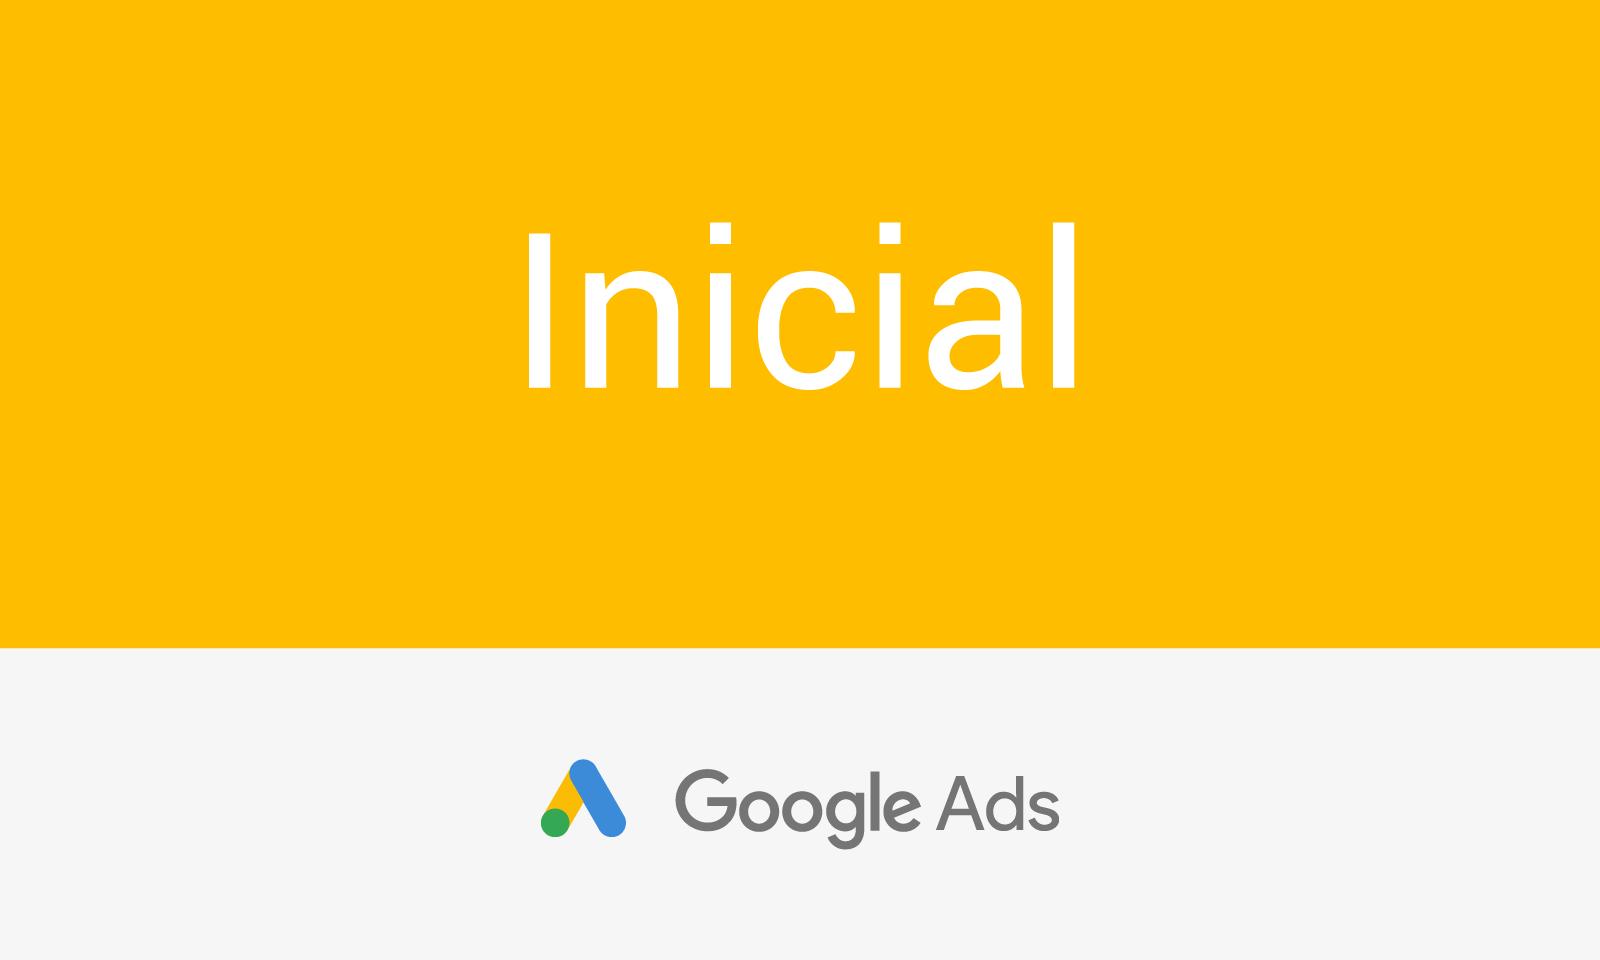 Inteligenzia - Curso Google Marketing Digital / Inicial